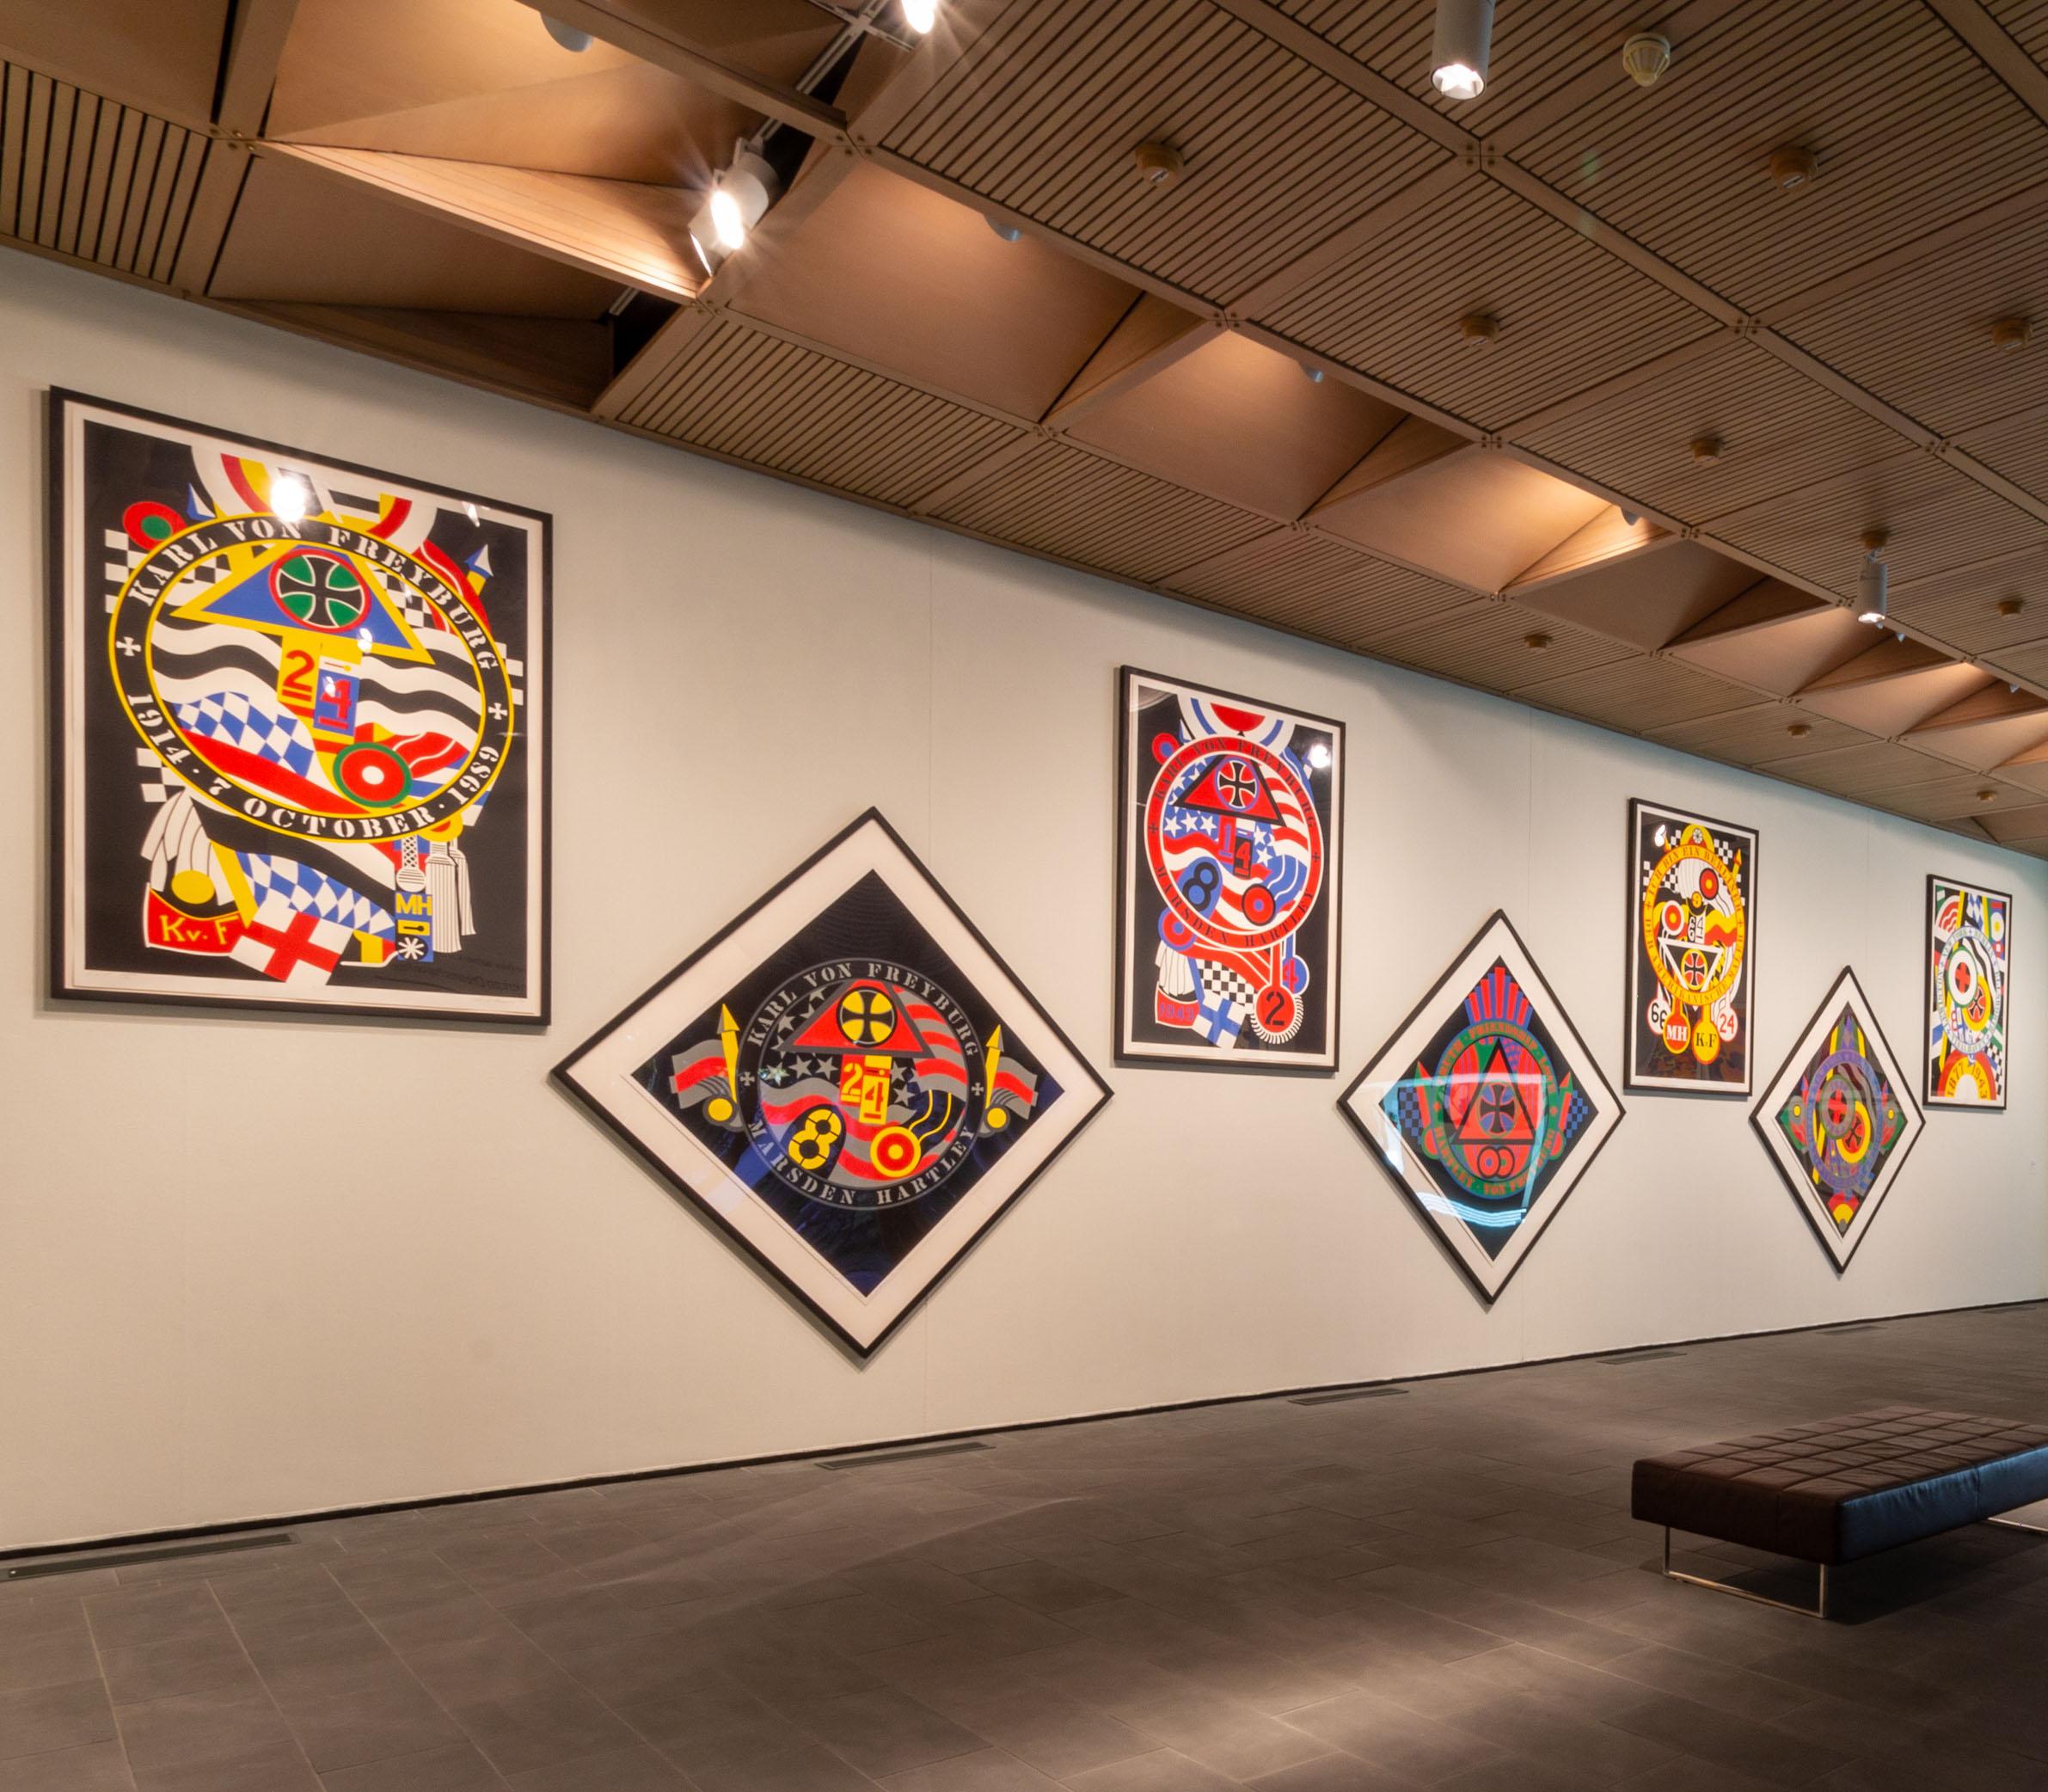 ArtFULL Wednesday: One-on-One: Robert Indiana, Hartley Elegies